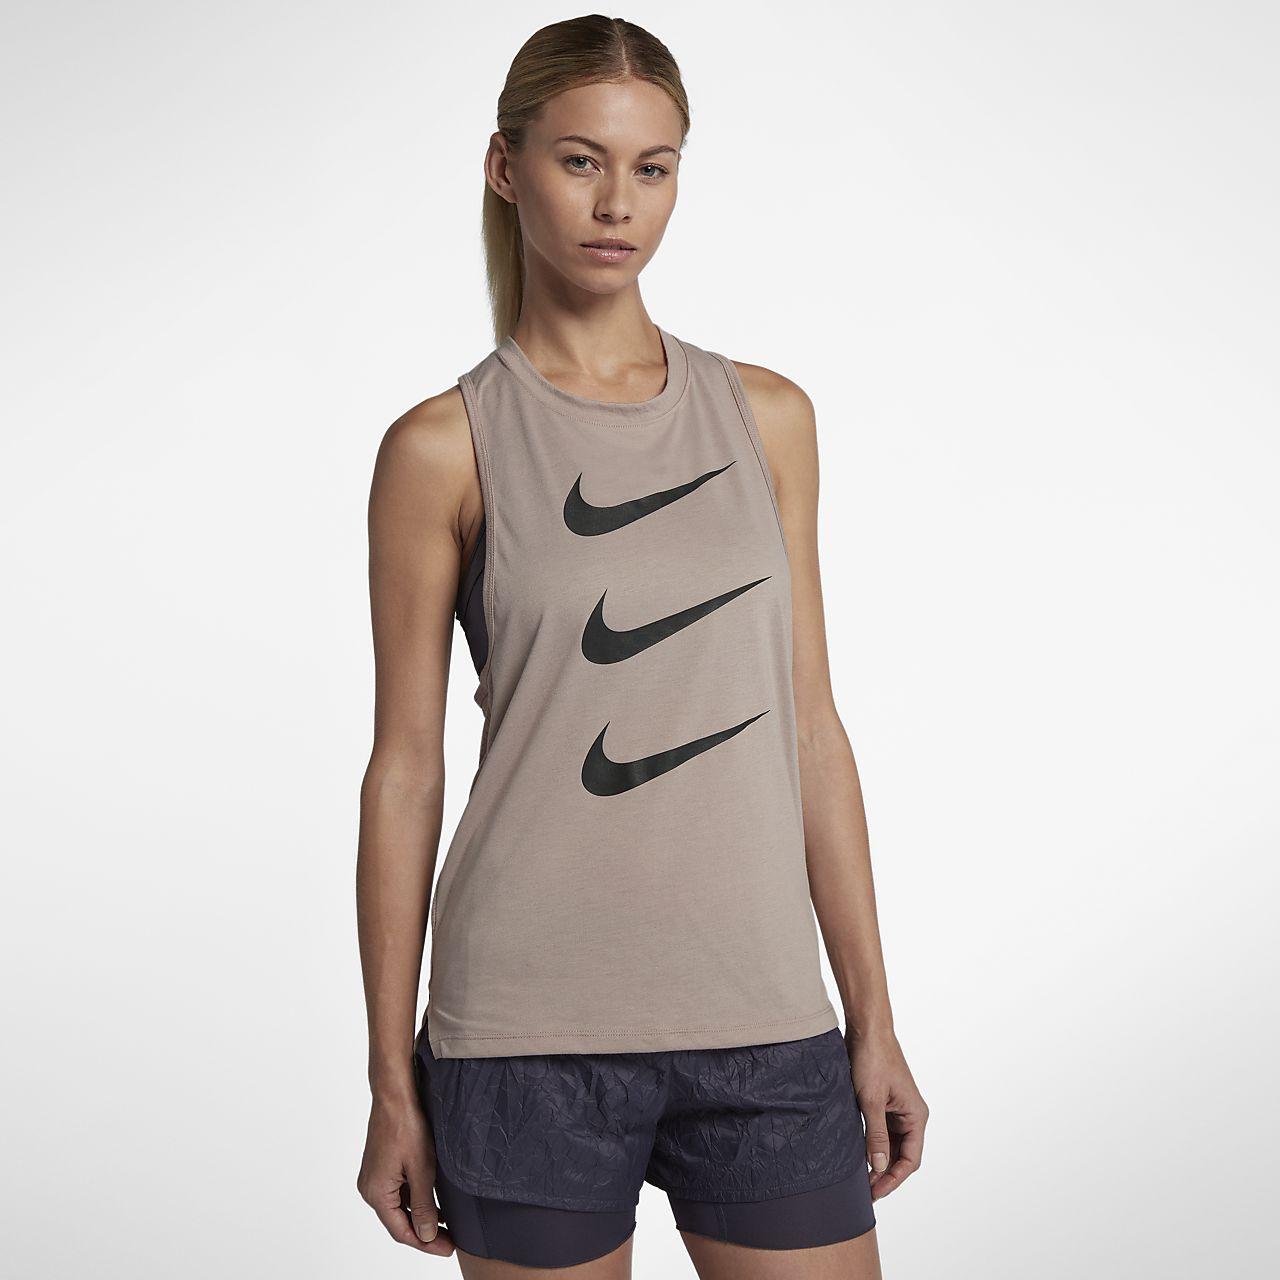 Nike Tailwind Run Division Women's Running Tank